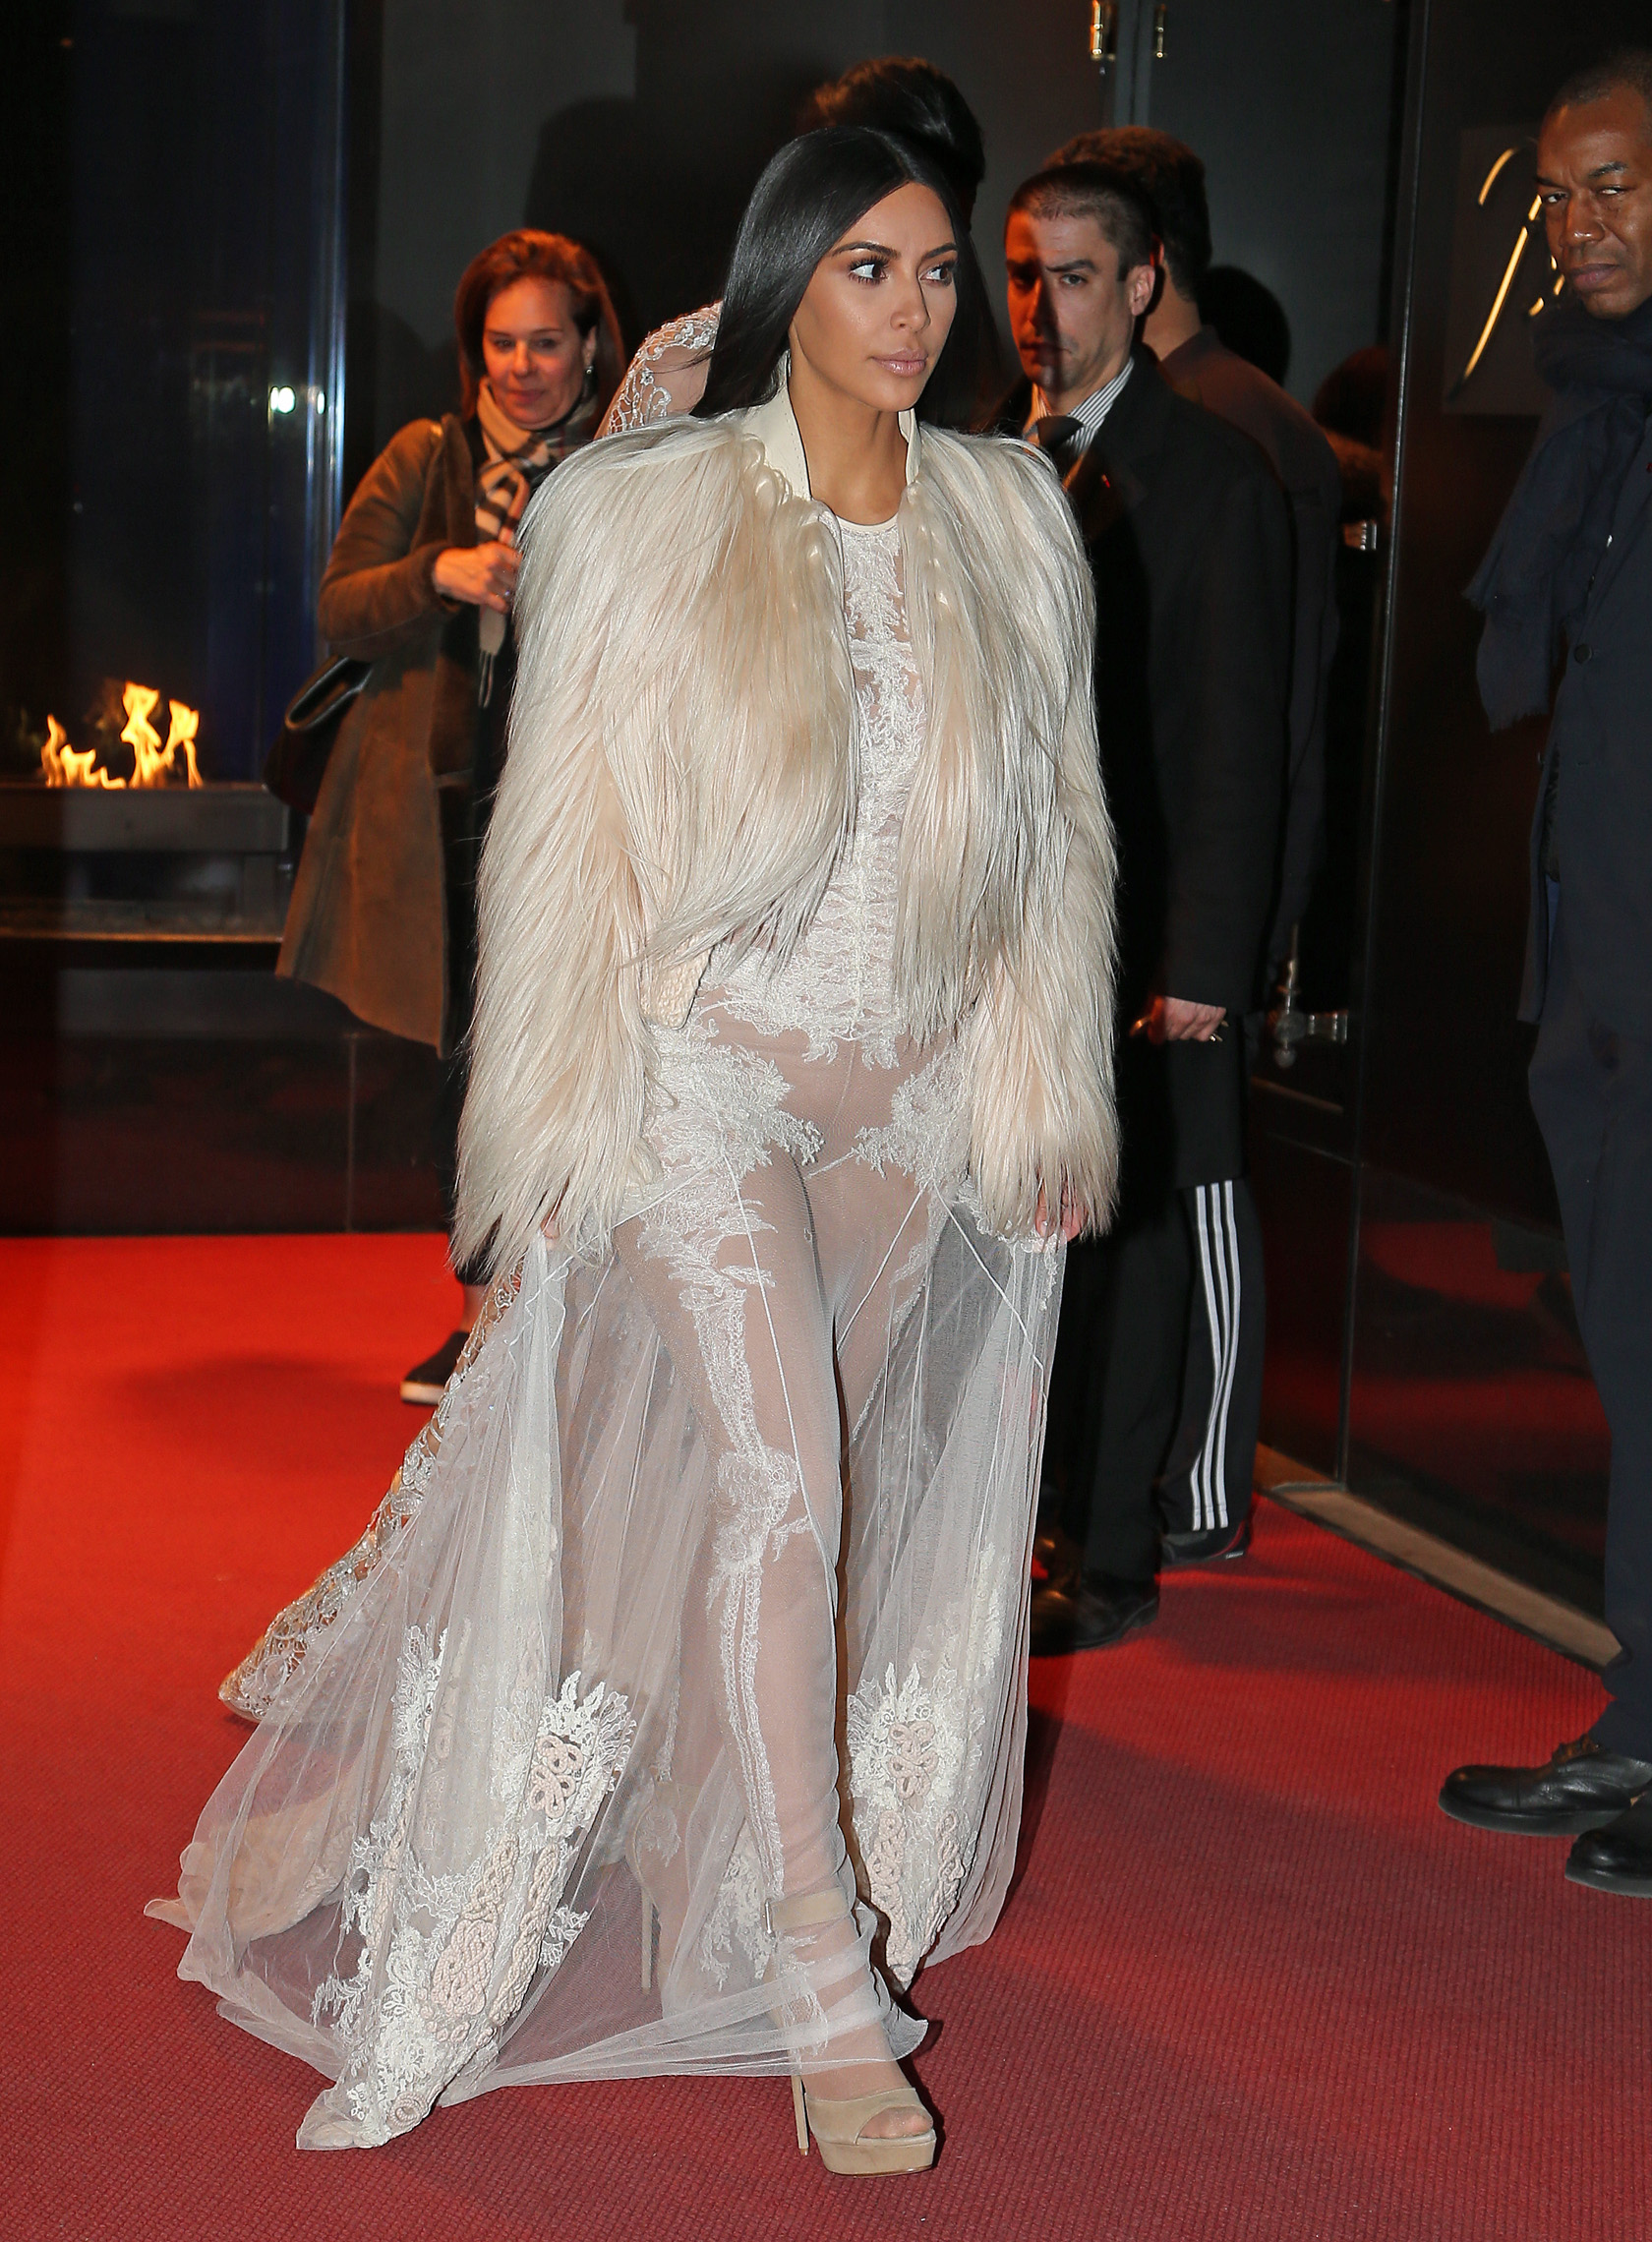 Kim Kardashian and Kendall Jenner film Ocean's 8 in New York City